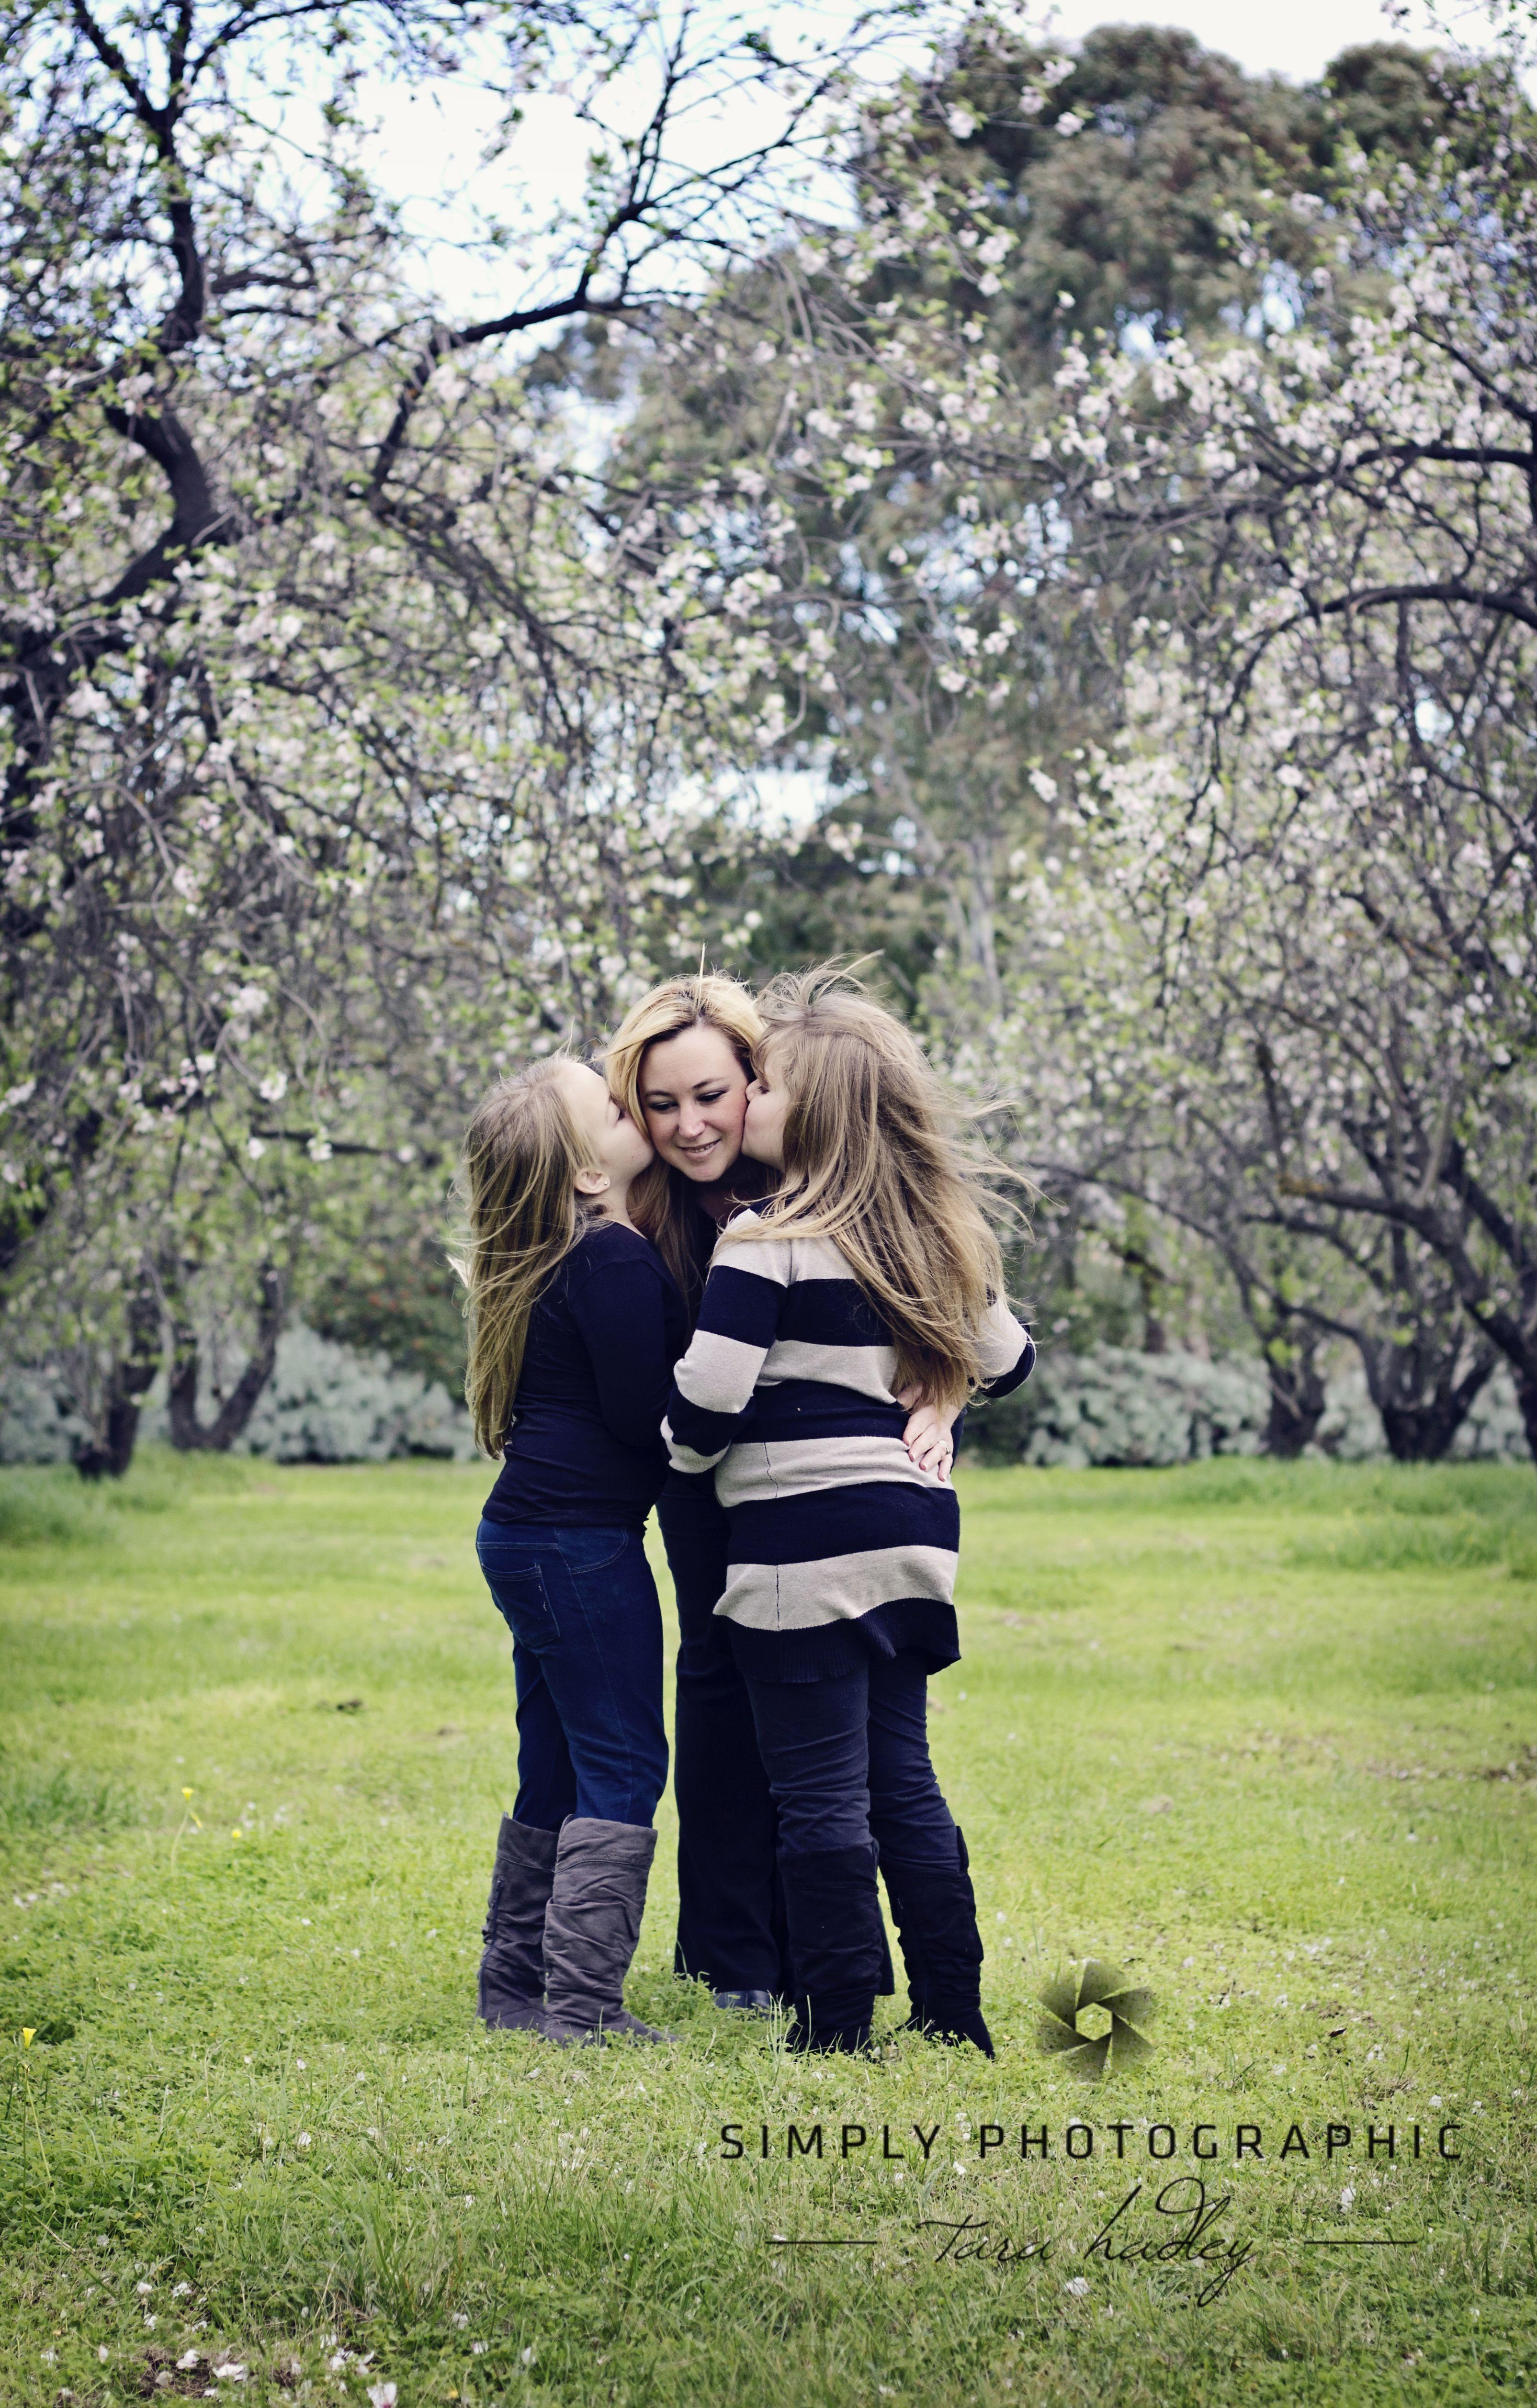 Mummy with her girls <3 #blossoms #adelaidephotographer #babieschildrenfamily https://www.facebook.com/simplyphotographic2012?ref=hl